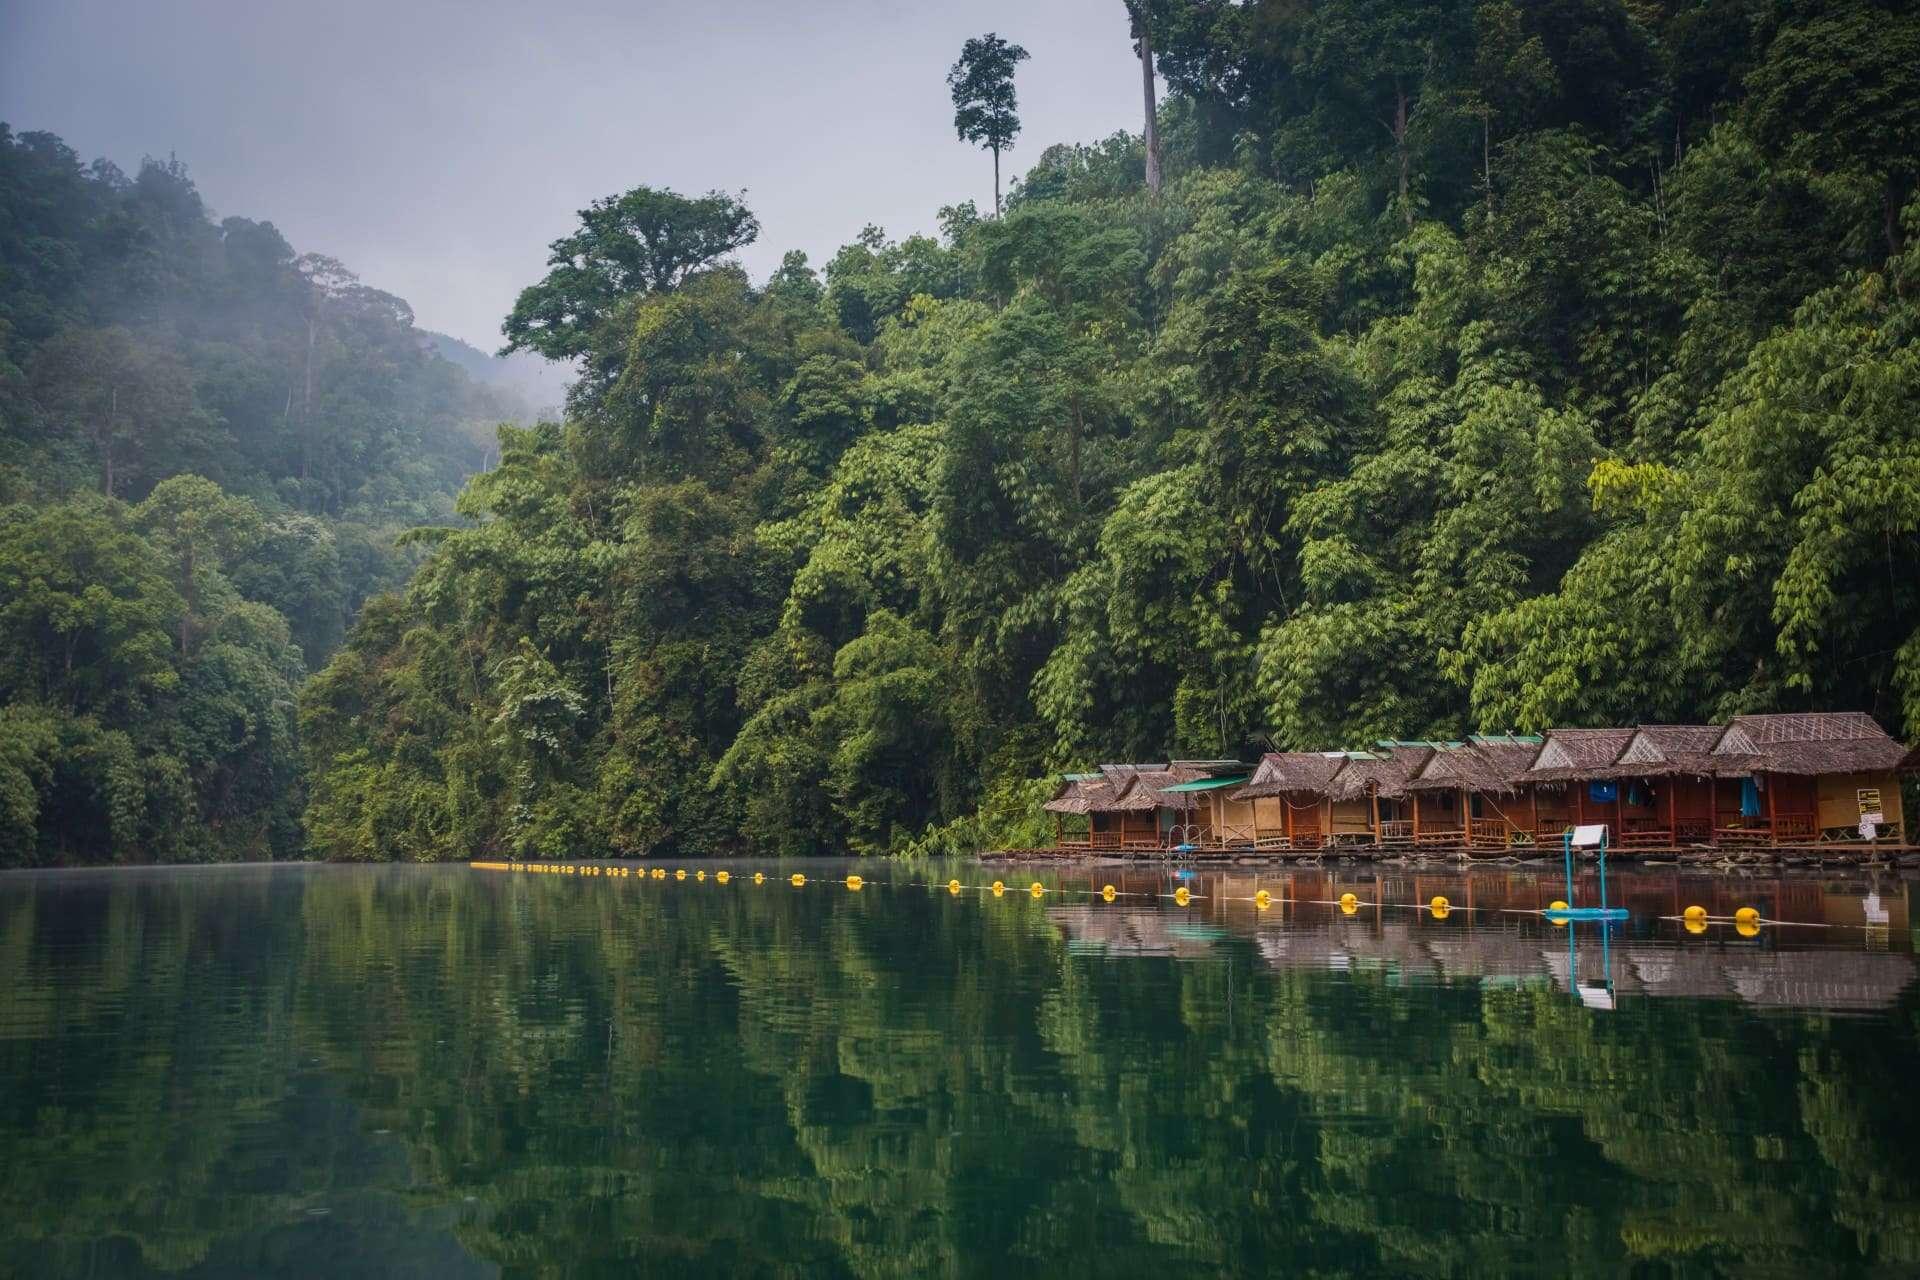 thailand-travel-guide-khao-sok-national-park